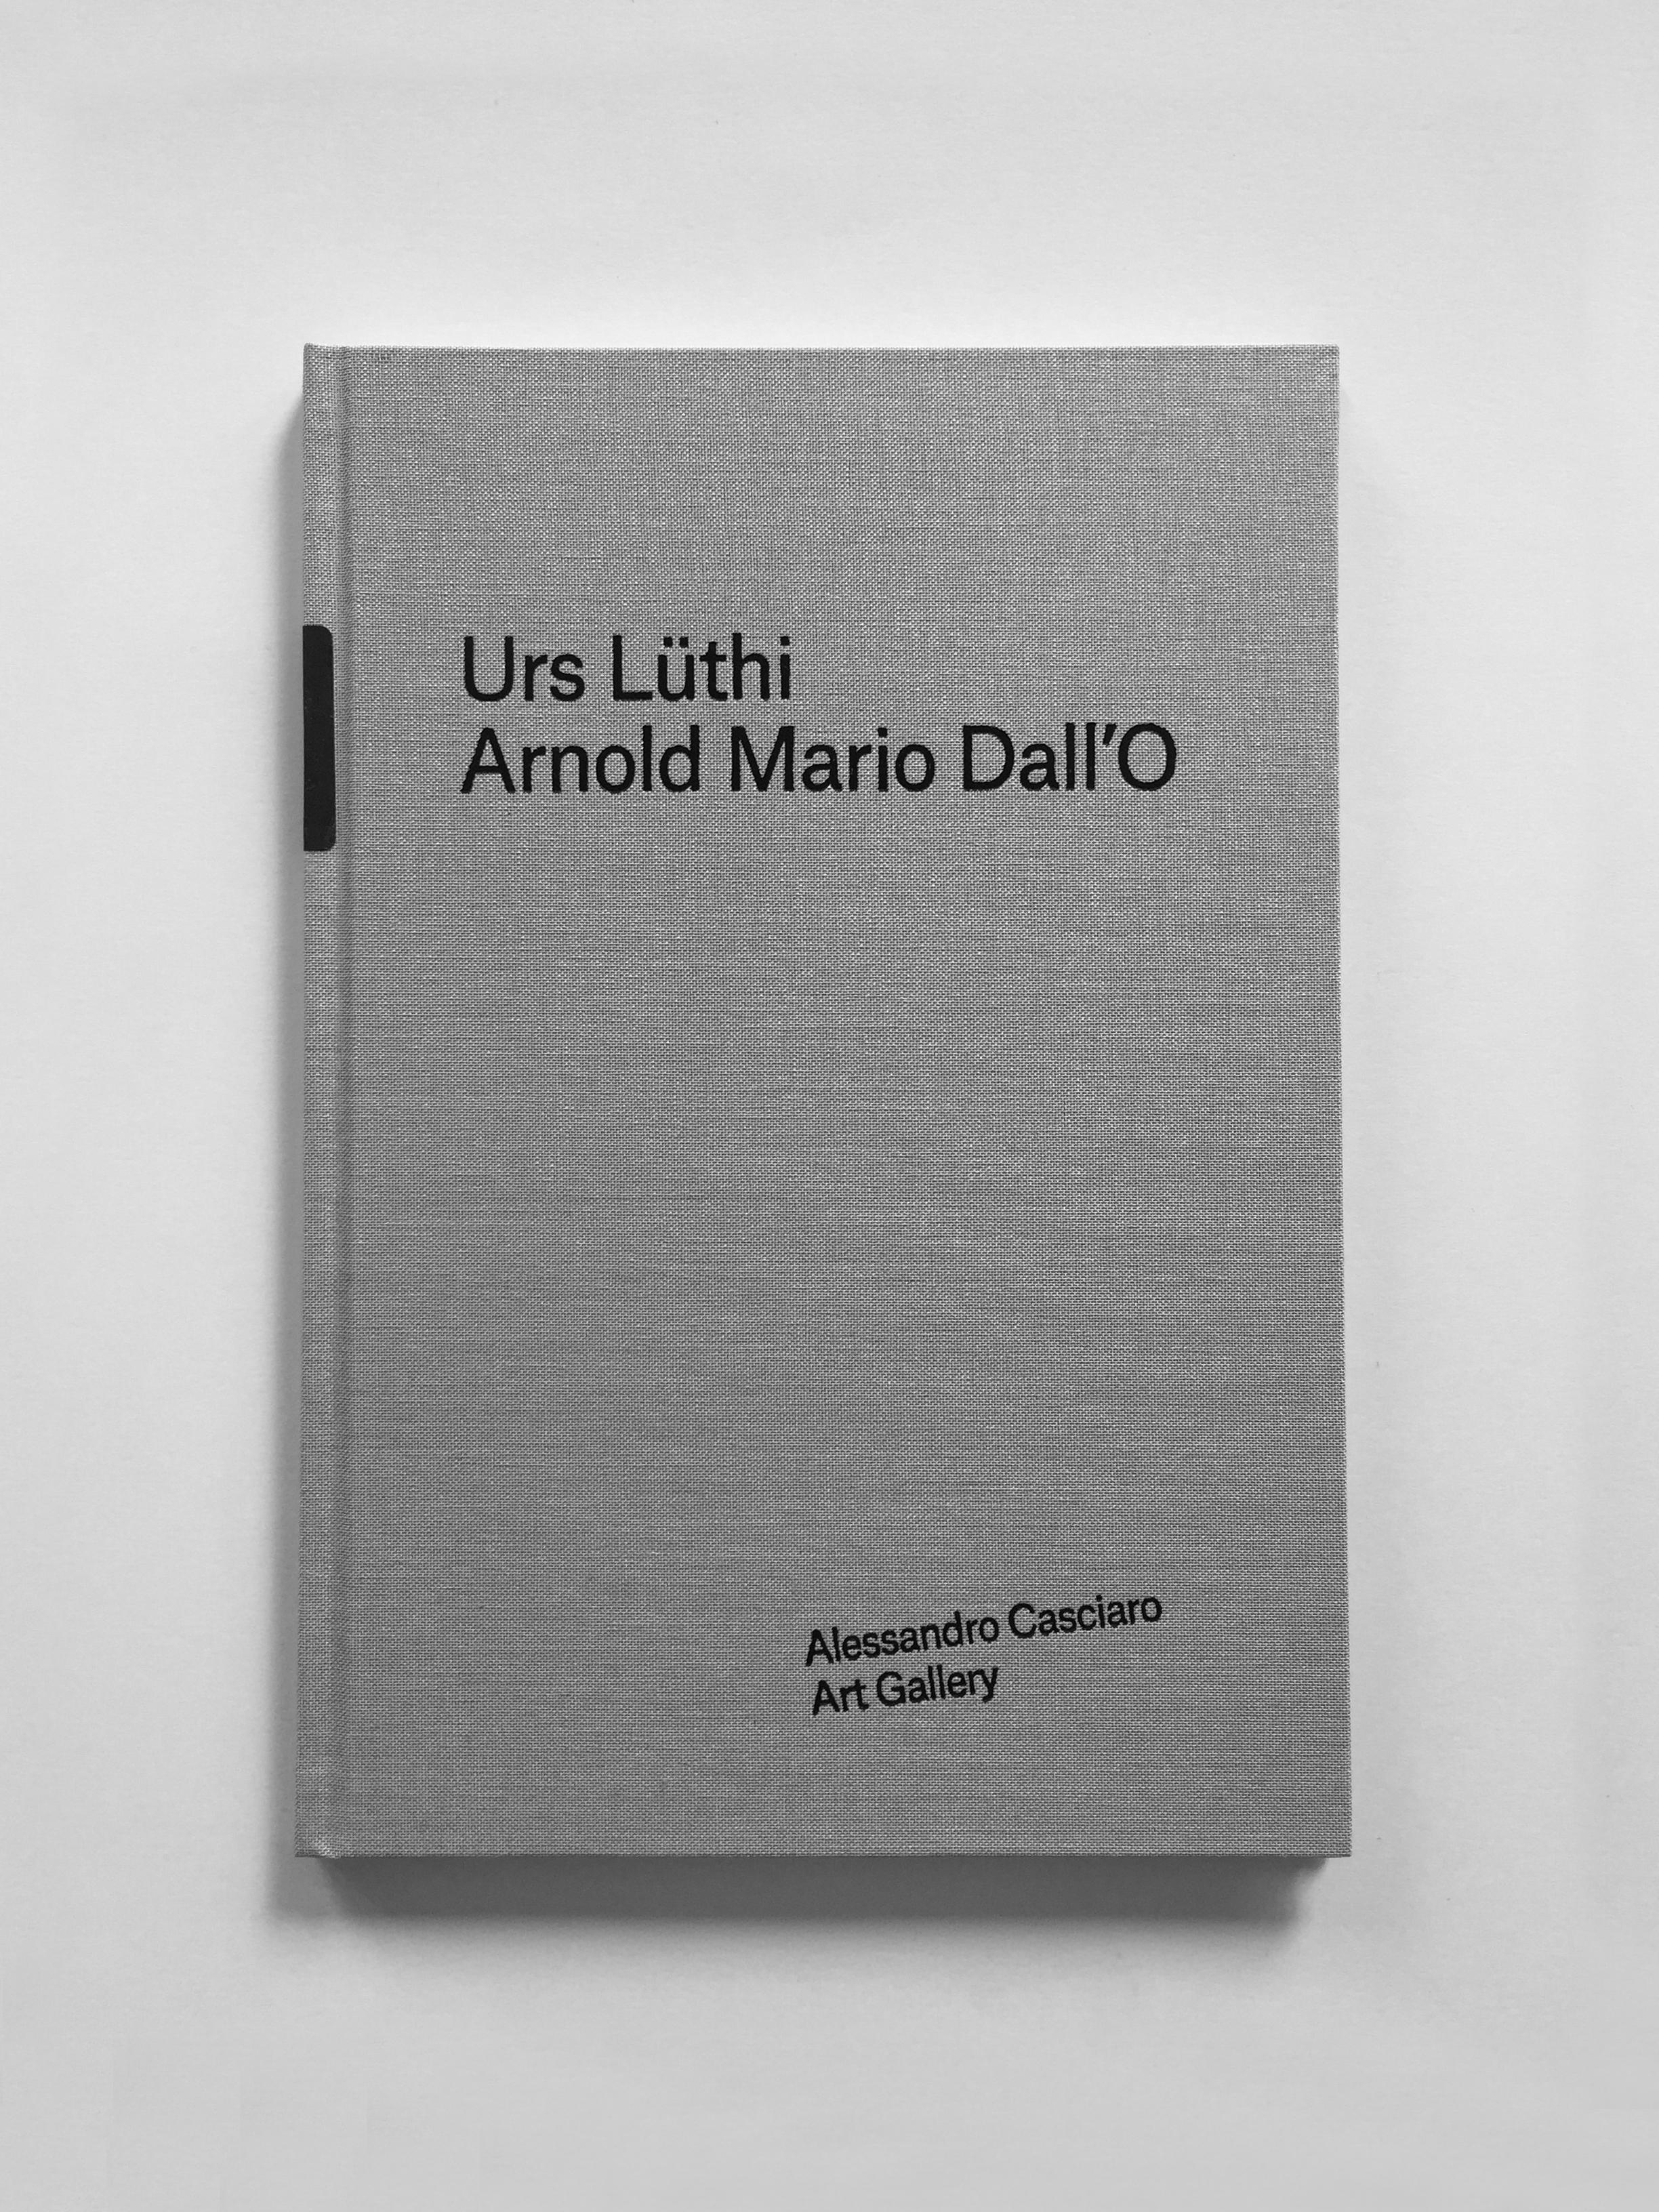 Urs Lüthi & Arnold Mario Dall'O